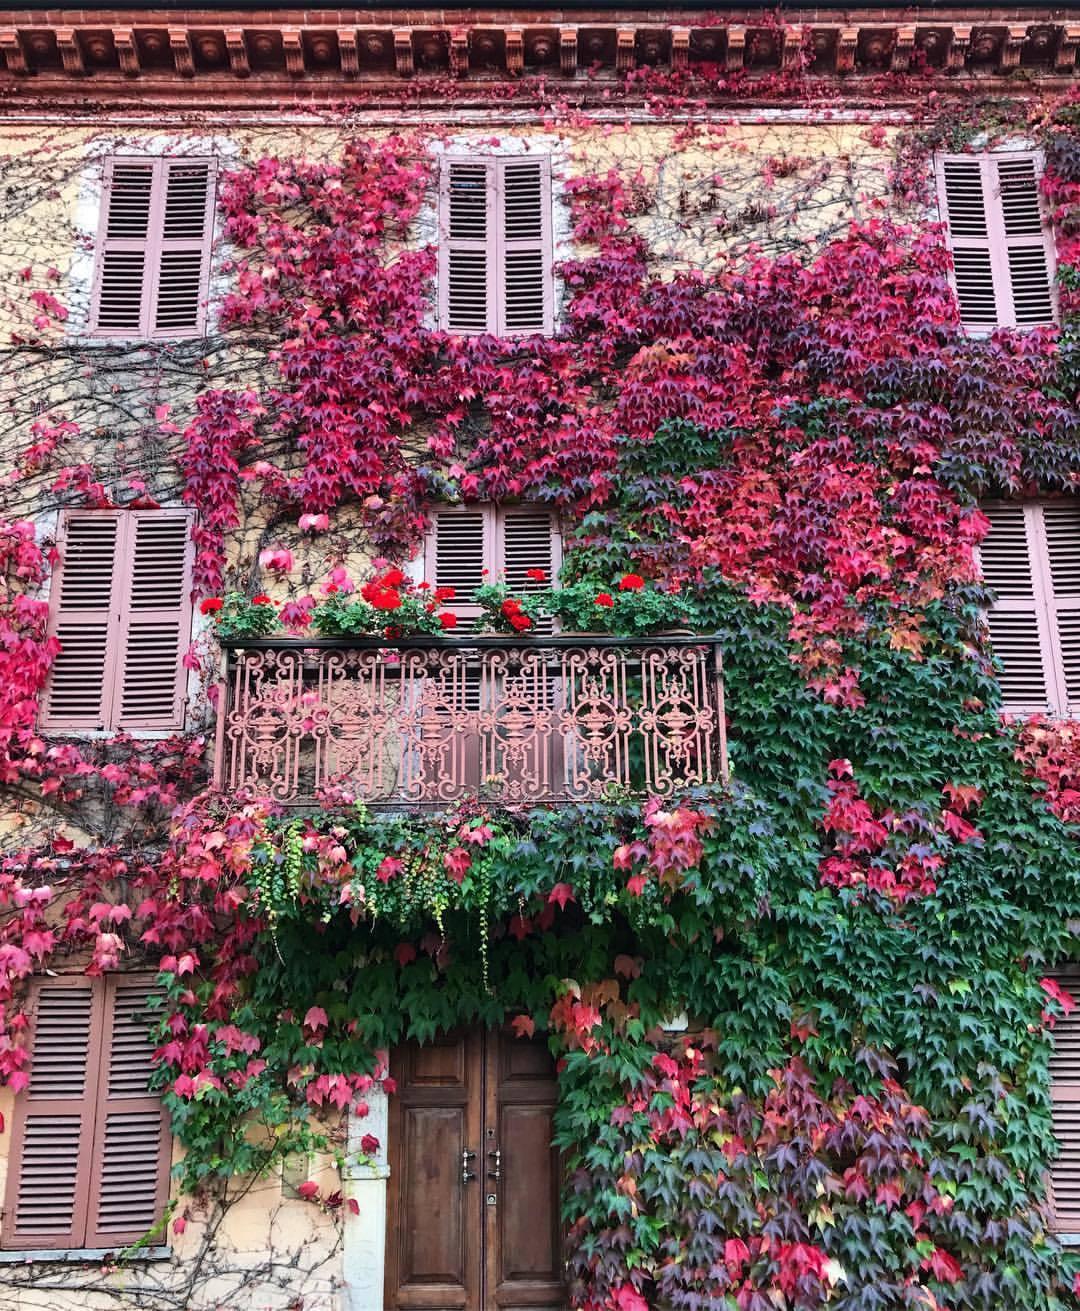 Autumn frosting.  -  #autumn #fall  (at Bossolasco)